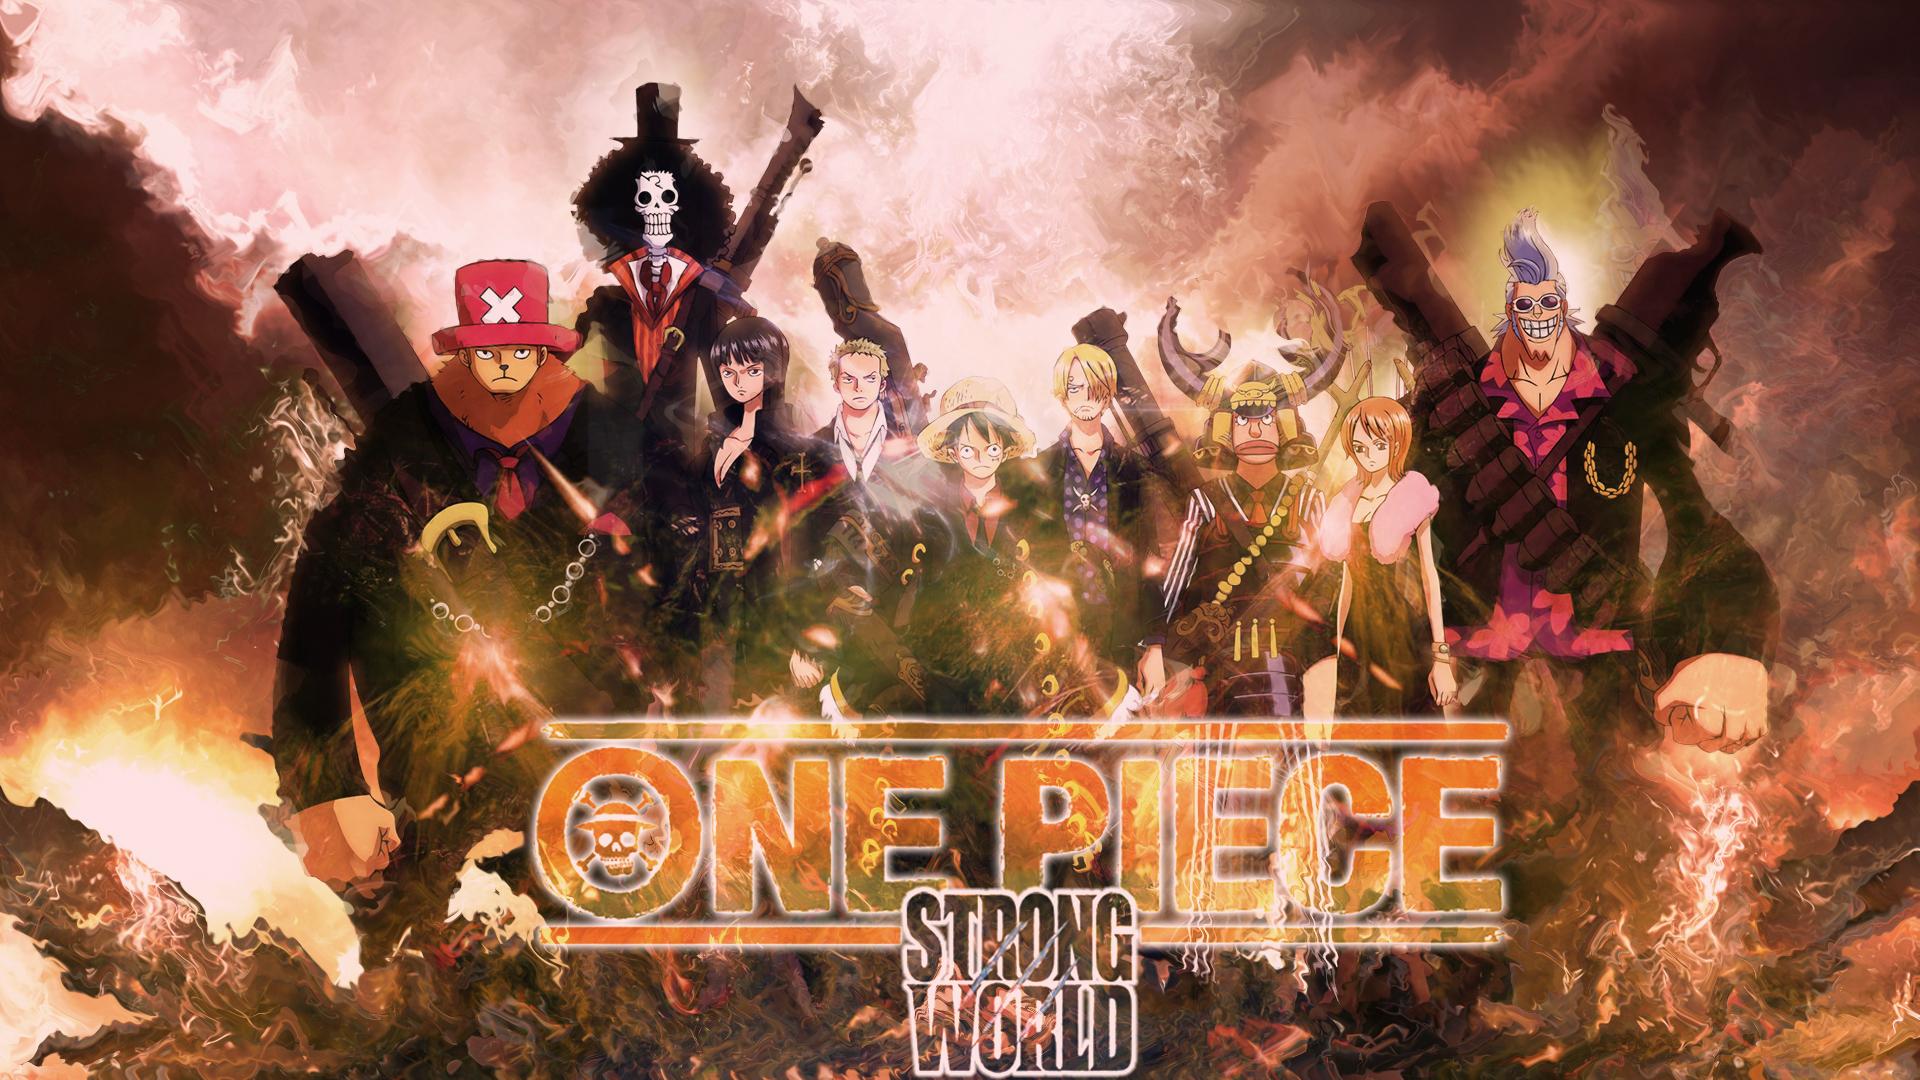 One Piece Wallpaper 2015 - WallpaperSafari